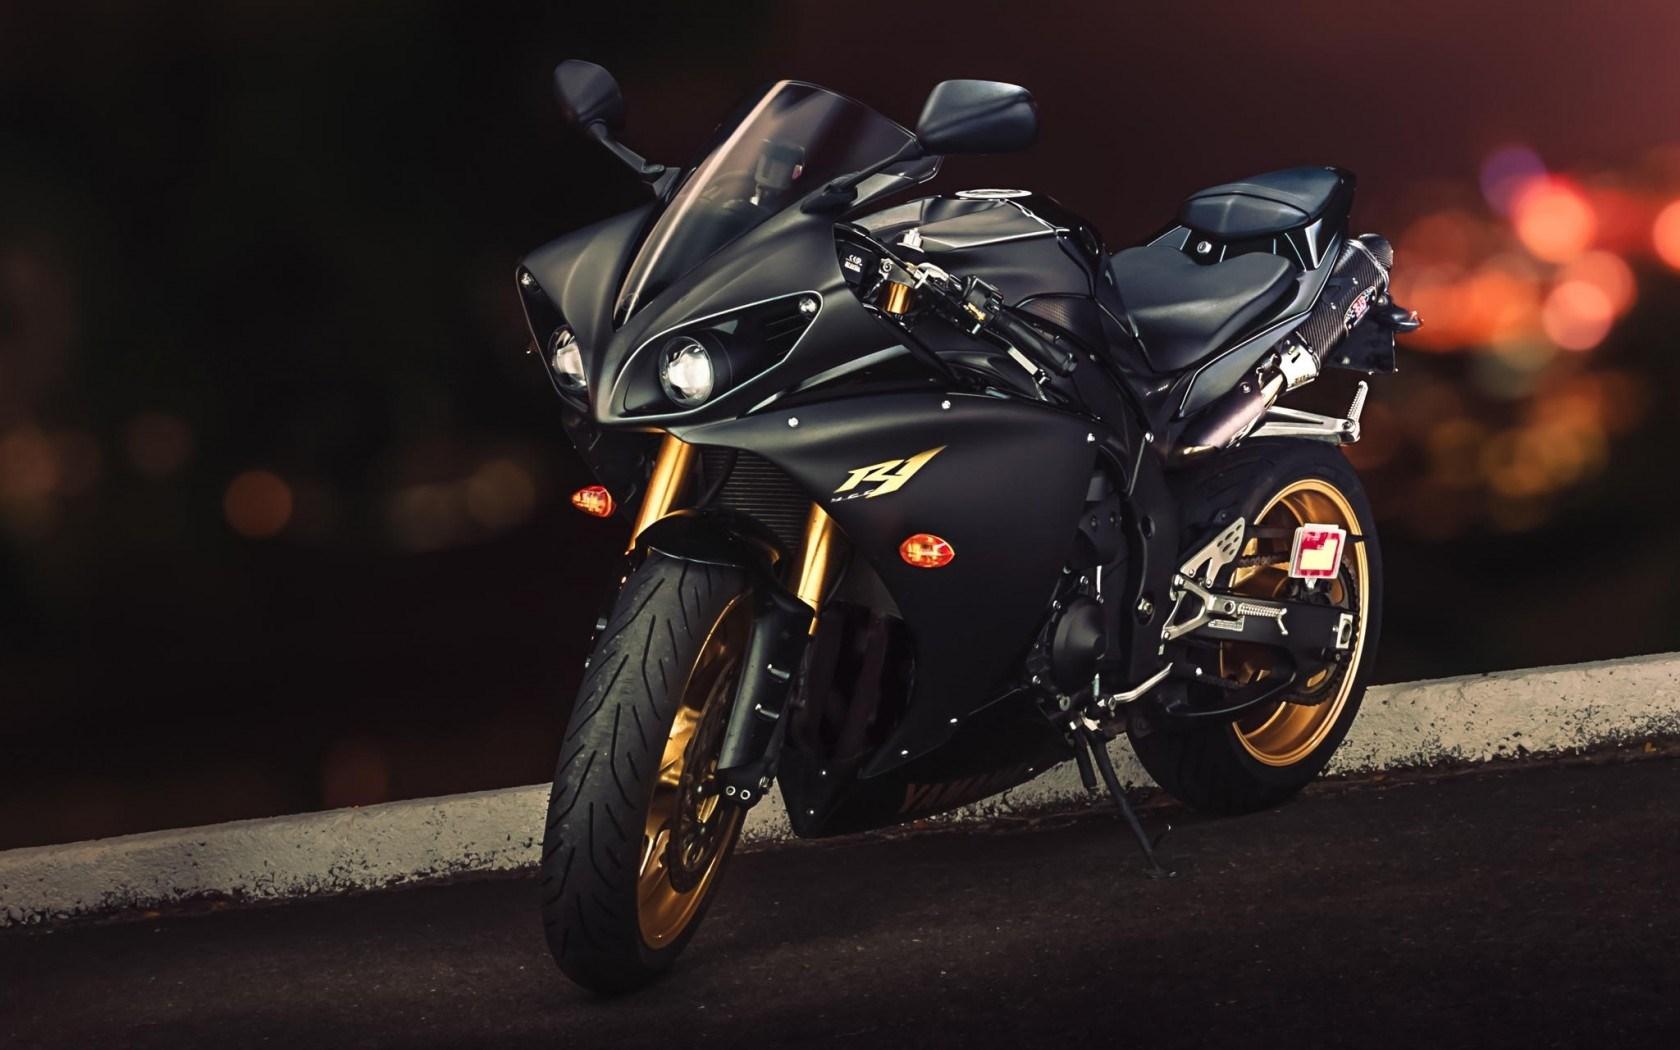 yamaha yzf r1 motorcycle road black photo sport widescreen 1680x1050